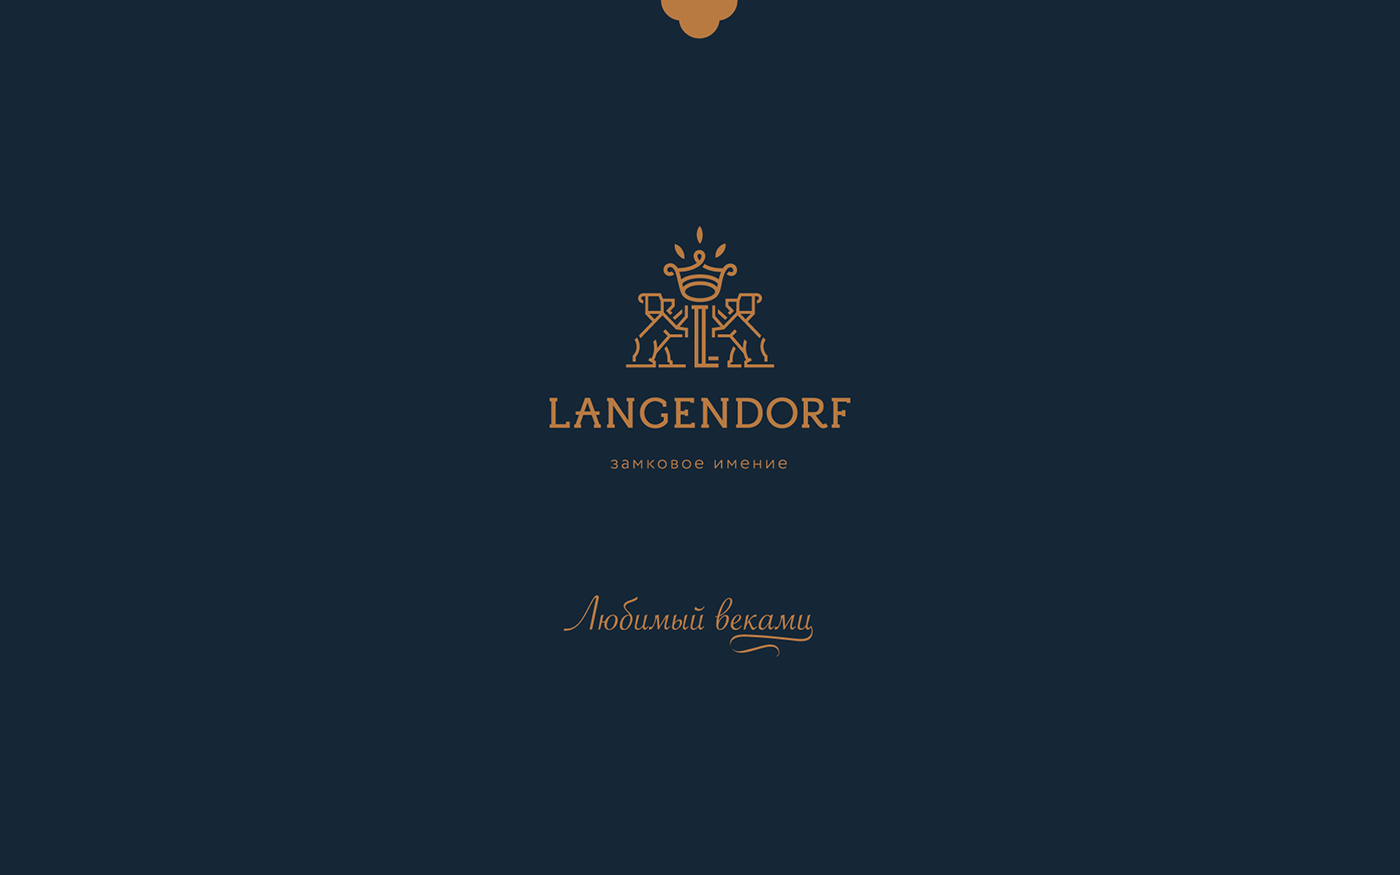 Logotype Langendorf history königsberg blue engraving gothic lettering